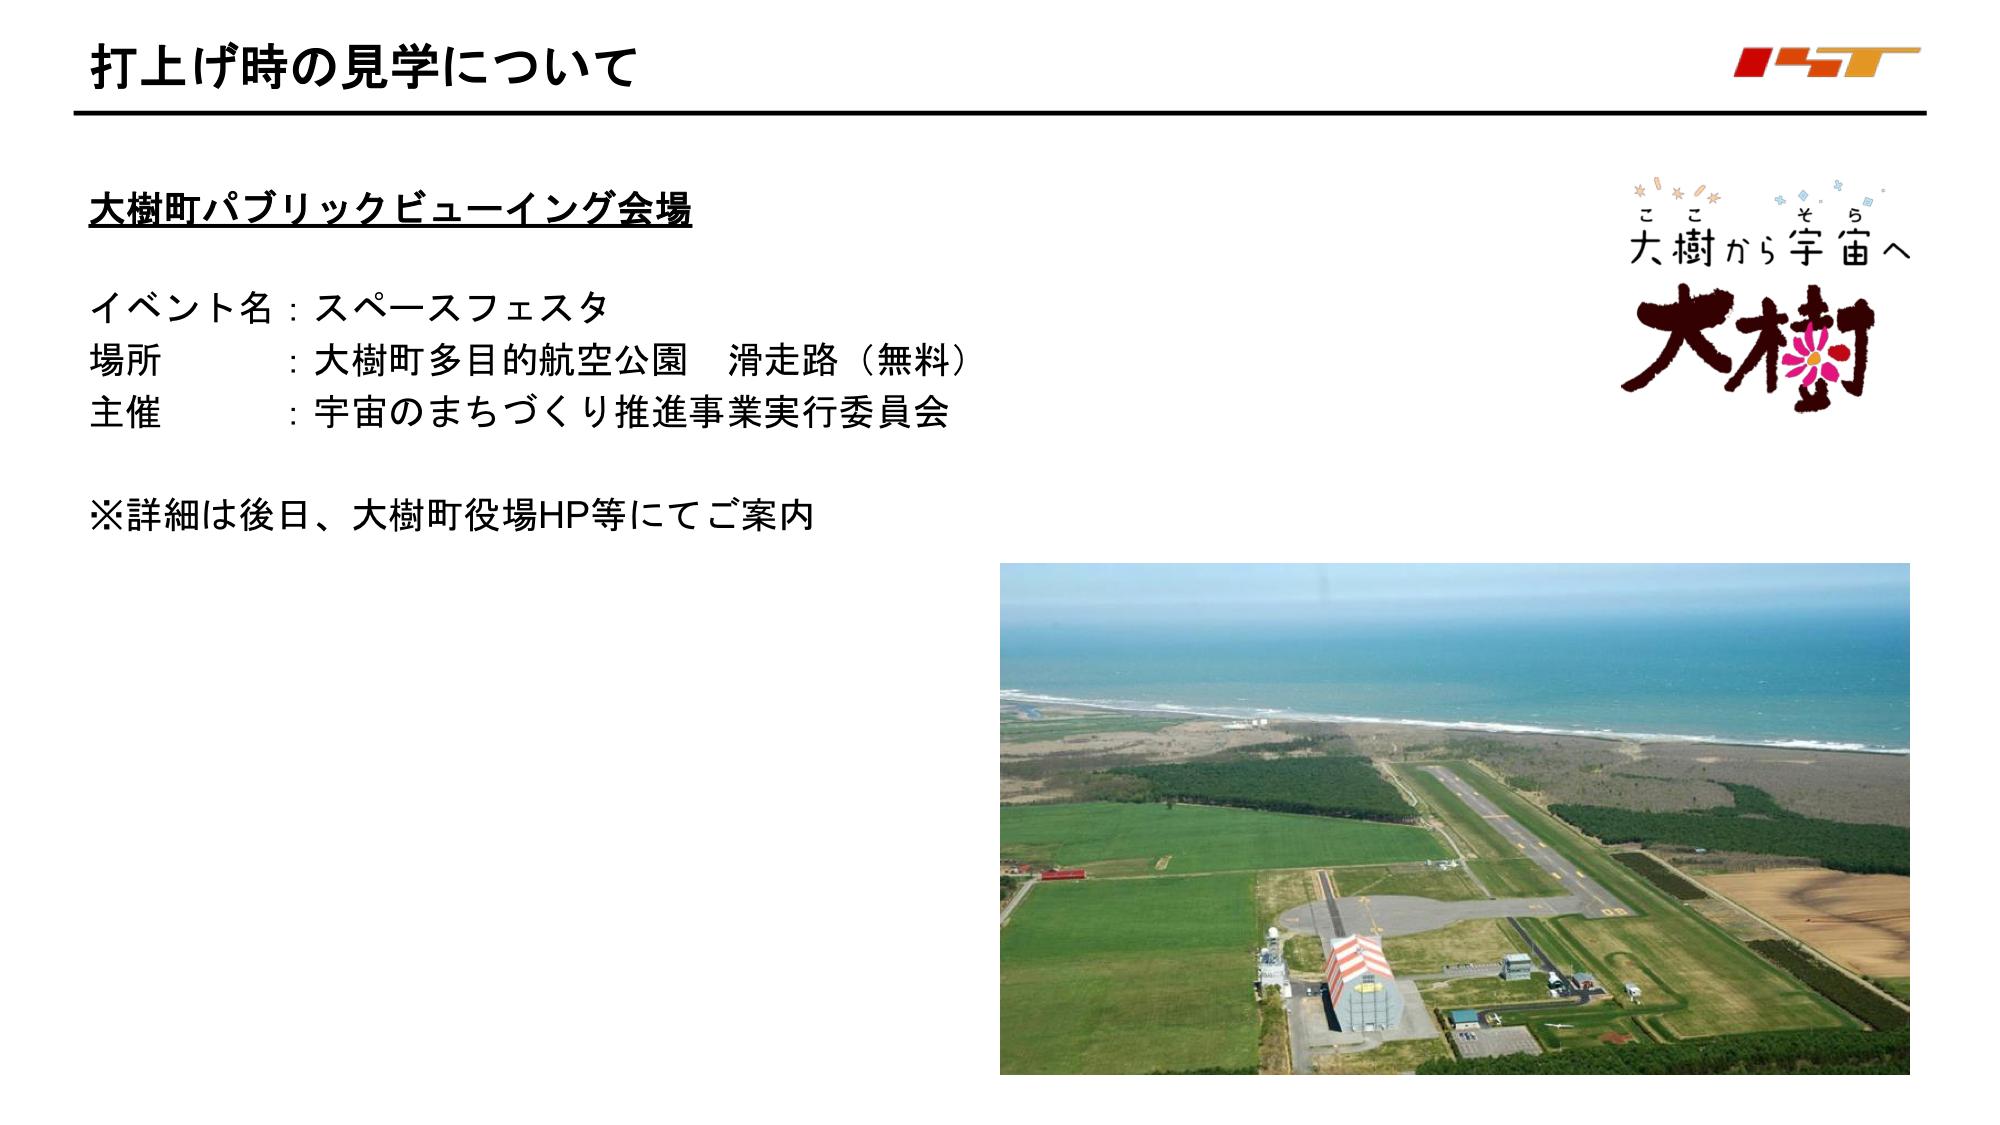 f:id:Imamura:20190628161422p:plain